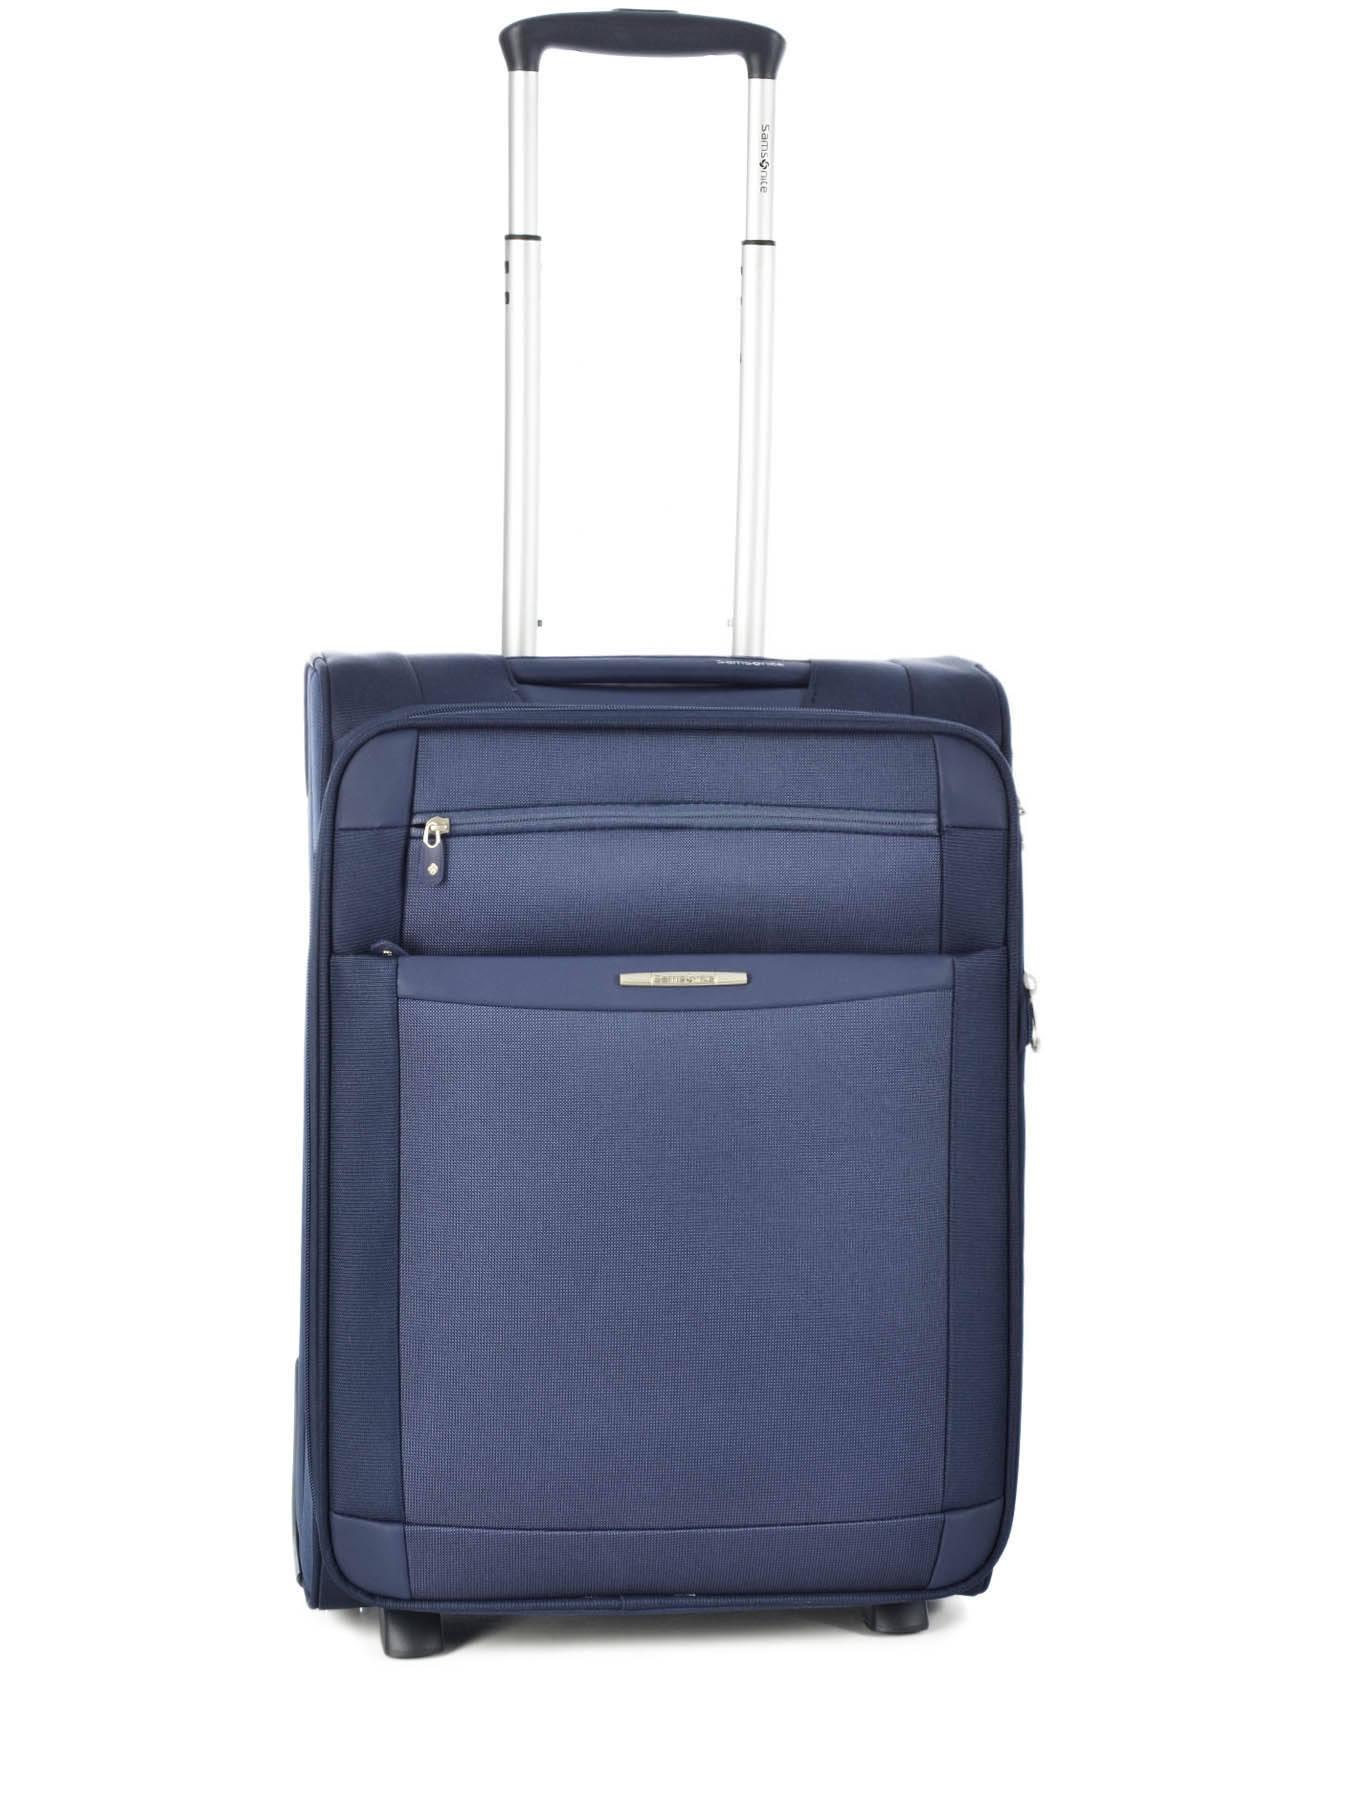 valise cabine samsonite dynamo 80d002 en vente au meilleur. Black Bedroom Furniture Sets. Home Design Ideas